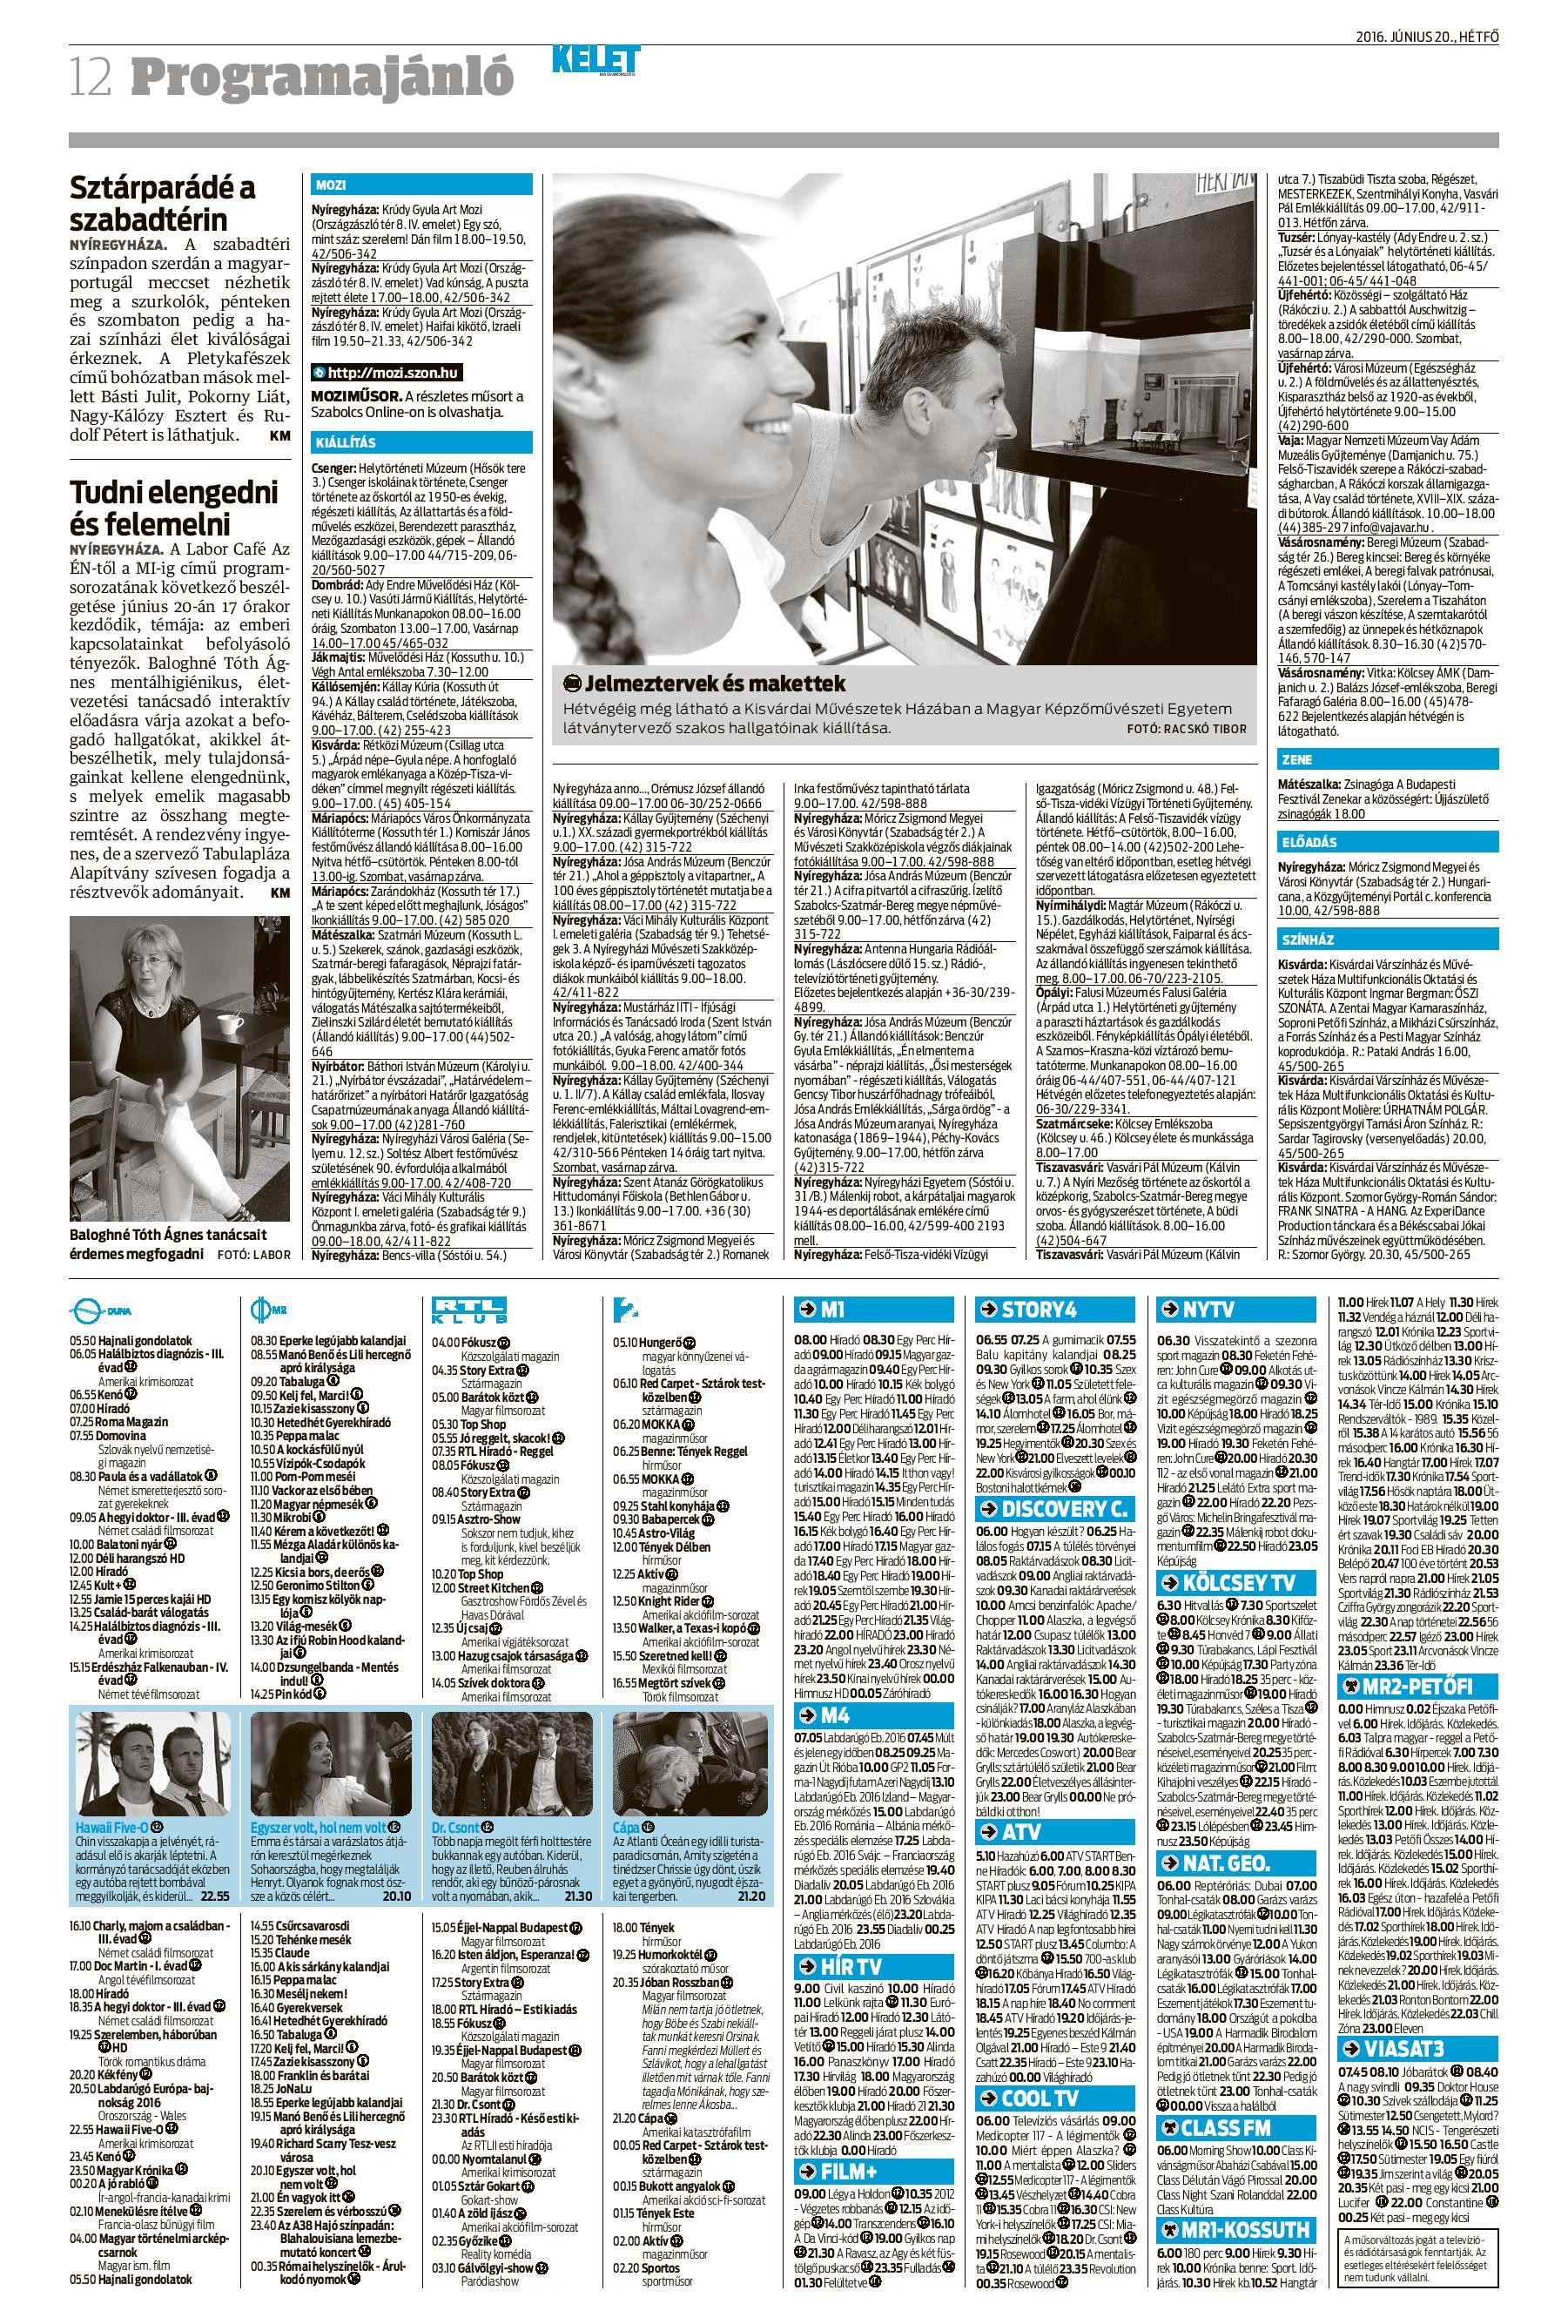 kemo012002006-page-001.jpg